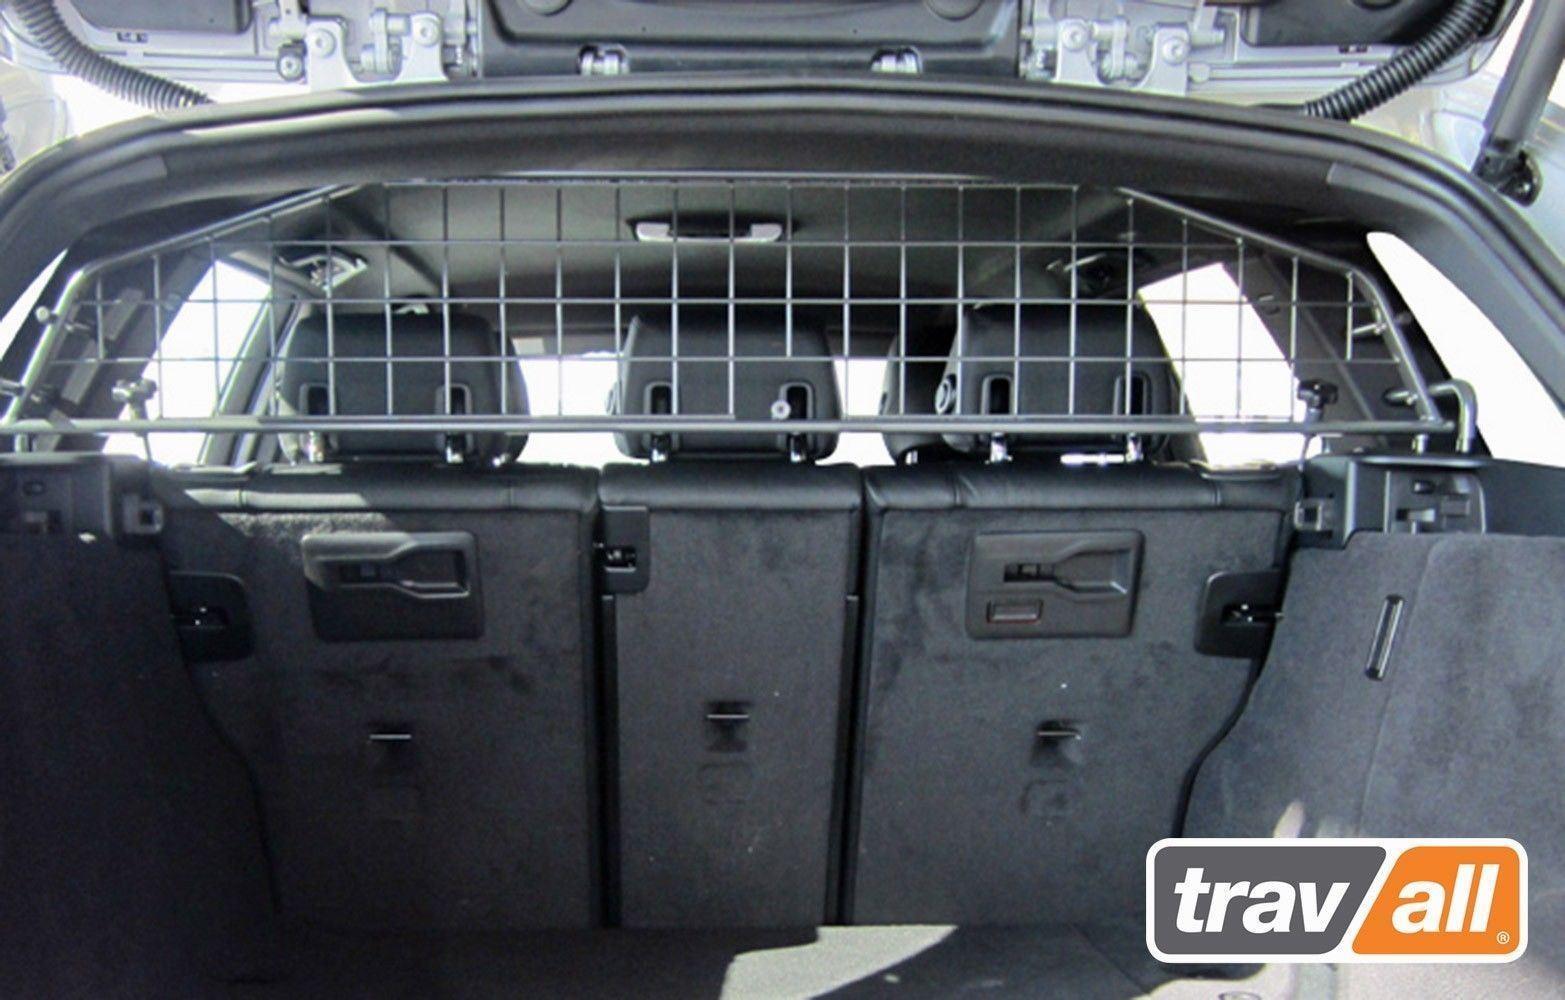 d0741462792 Details about TRAVALL DOG GUARD + CAR FLOOR MATS - BMW 3 SERIES TOURING  2012-